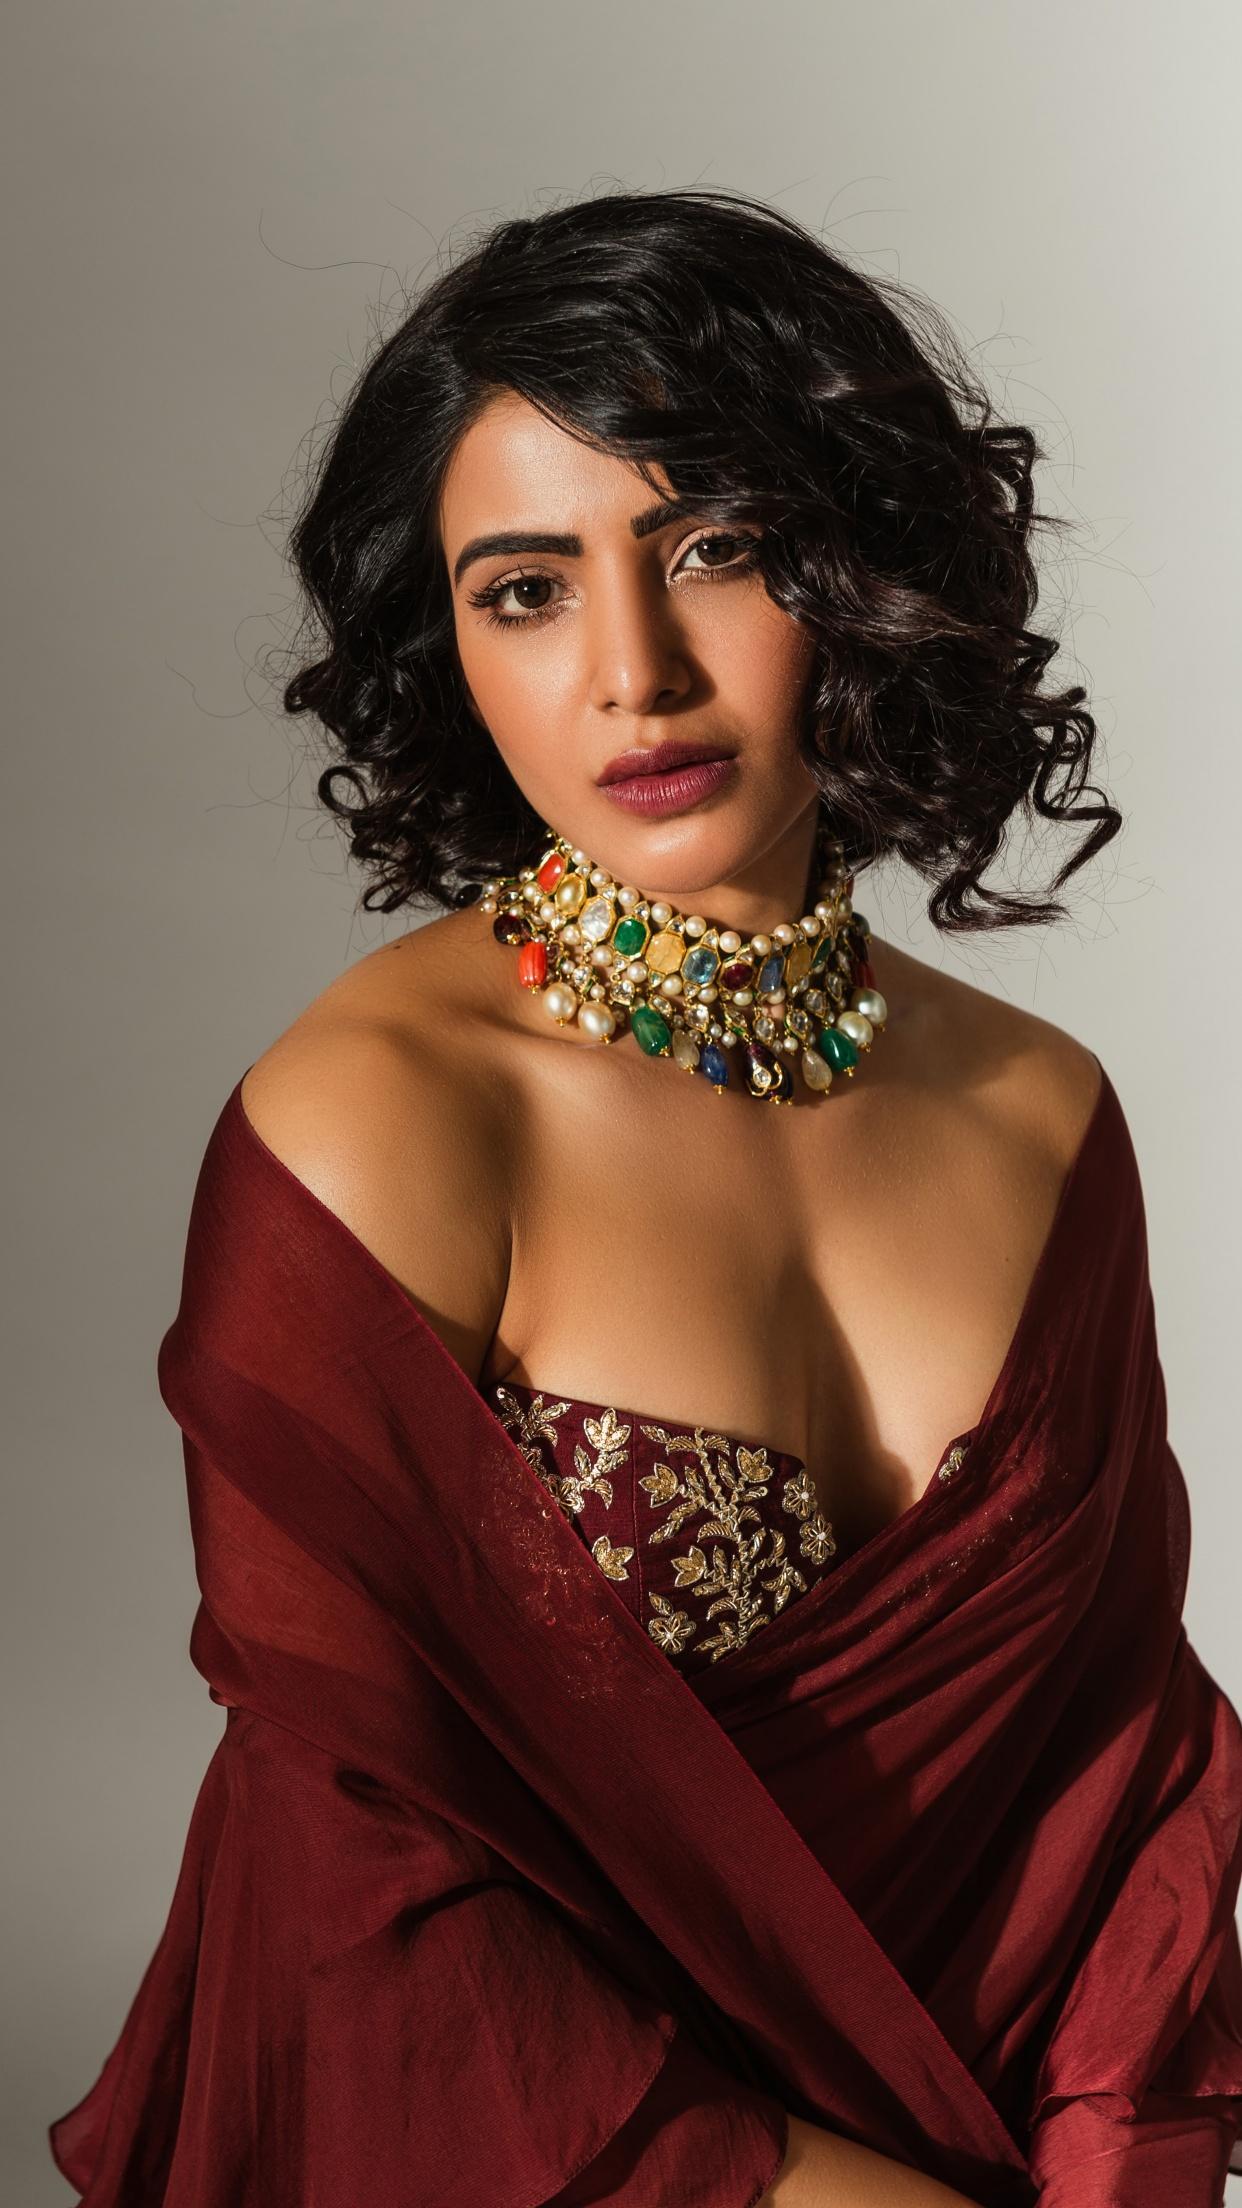 Hot indian desi woman in nighty showing Big Boobs pic